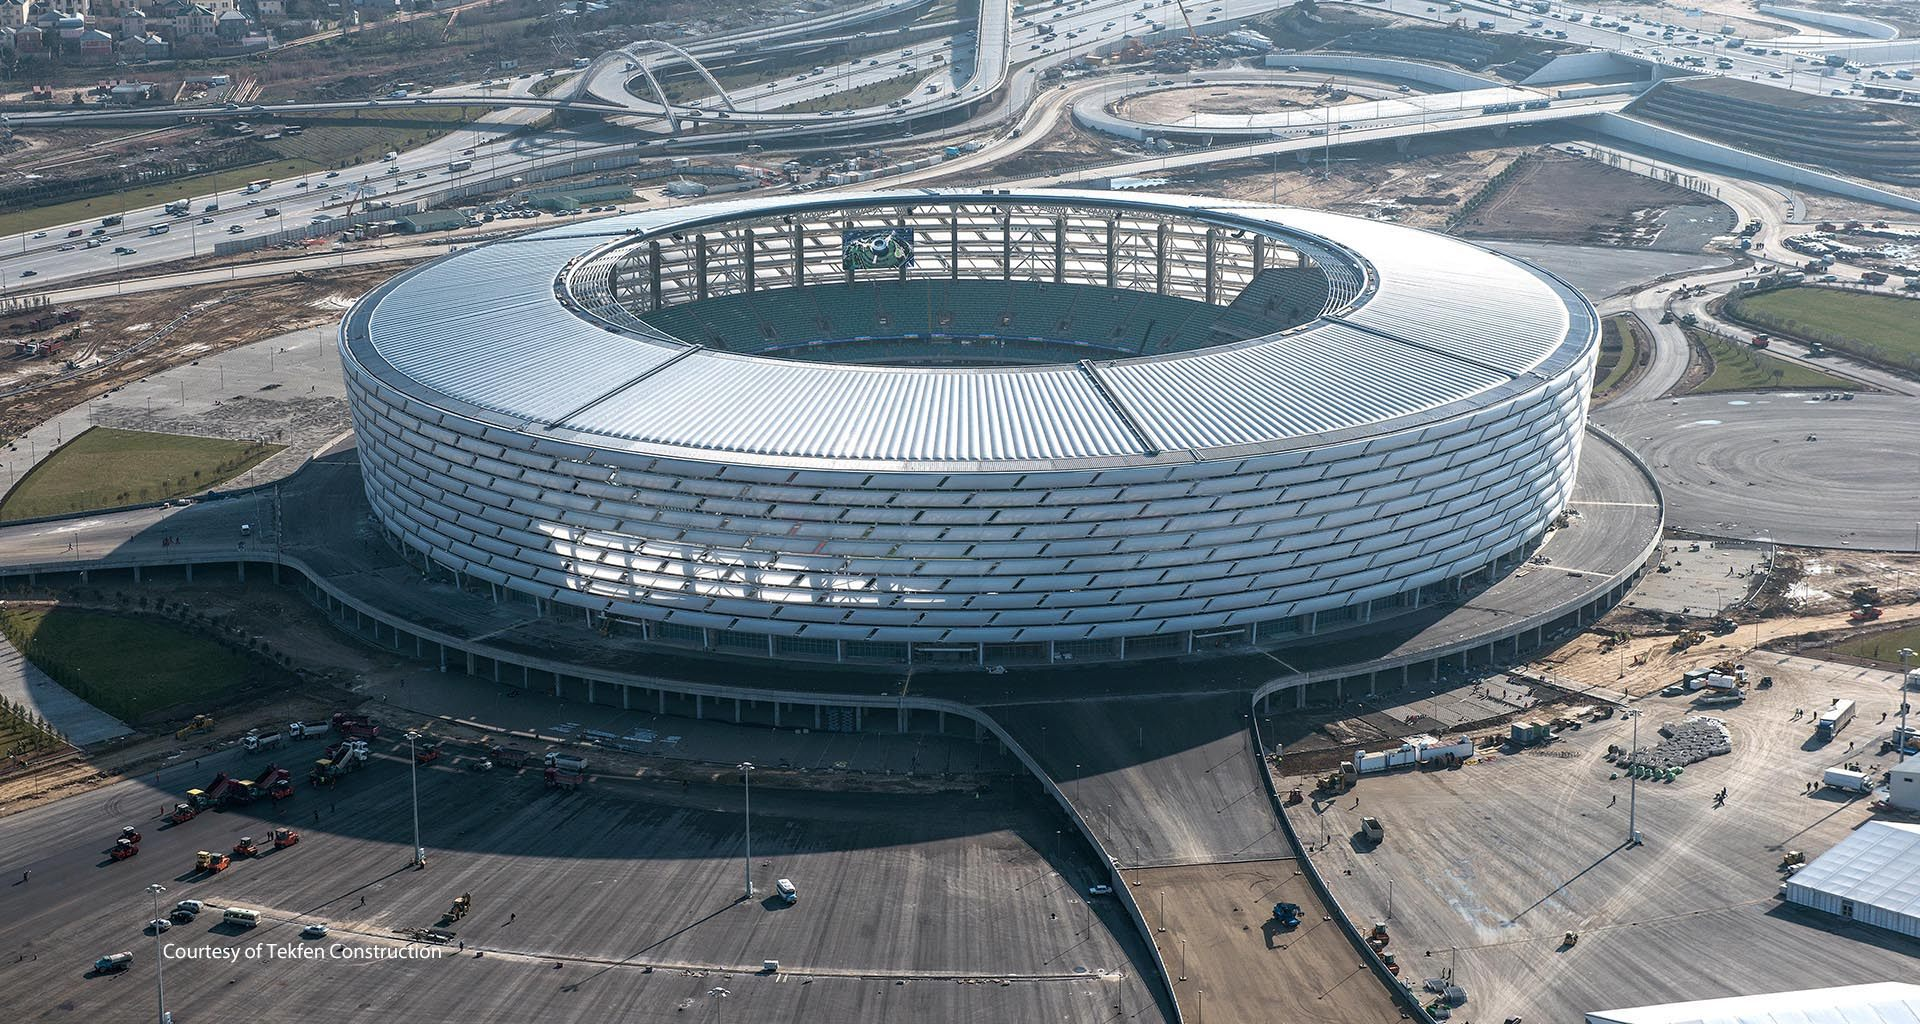 http://stadiumdb.com/pictures/stadiums/aze/baku_olympic_stadium/baku_olympic_stadium14.jpg